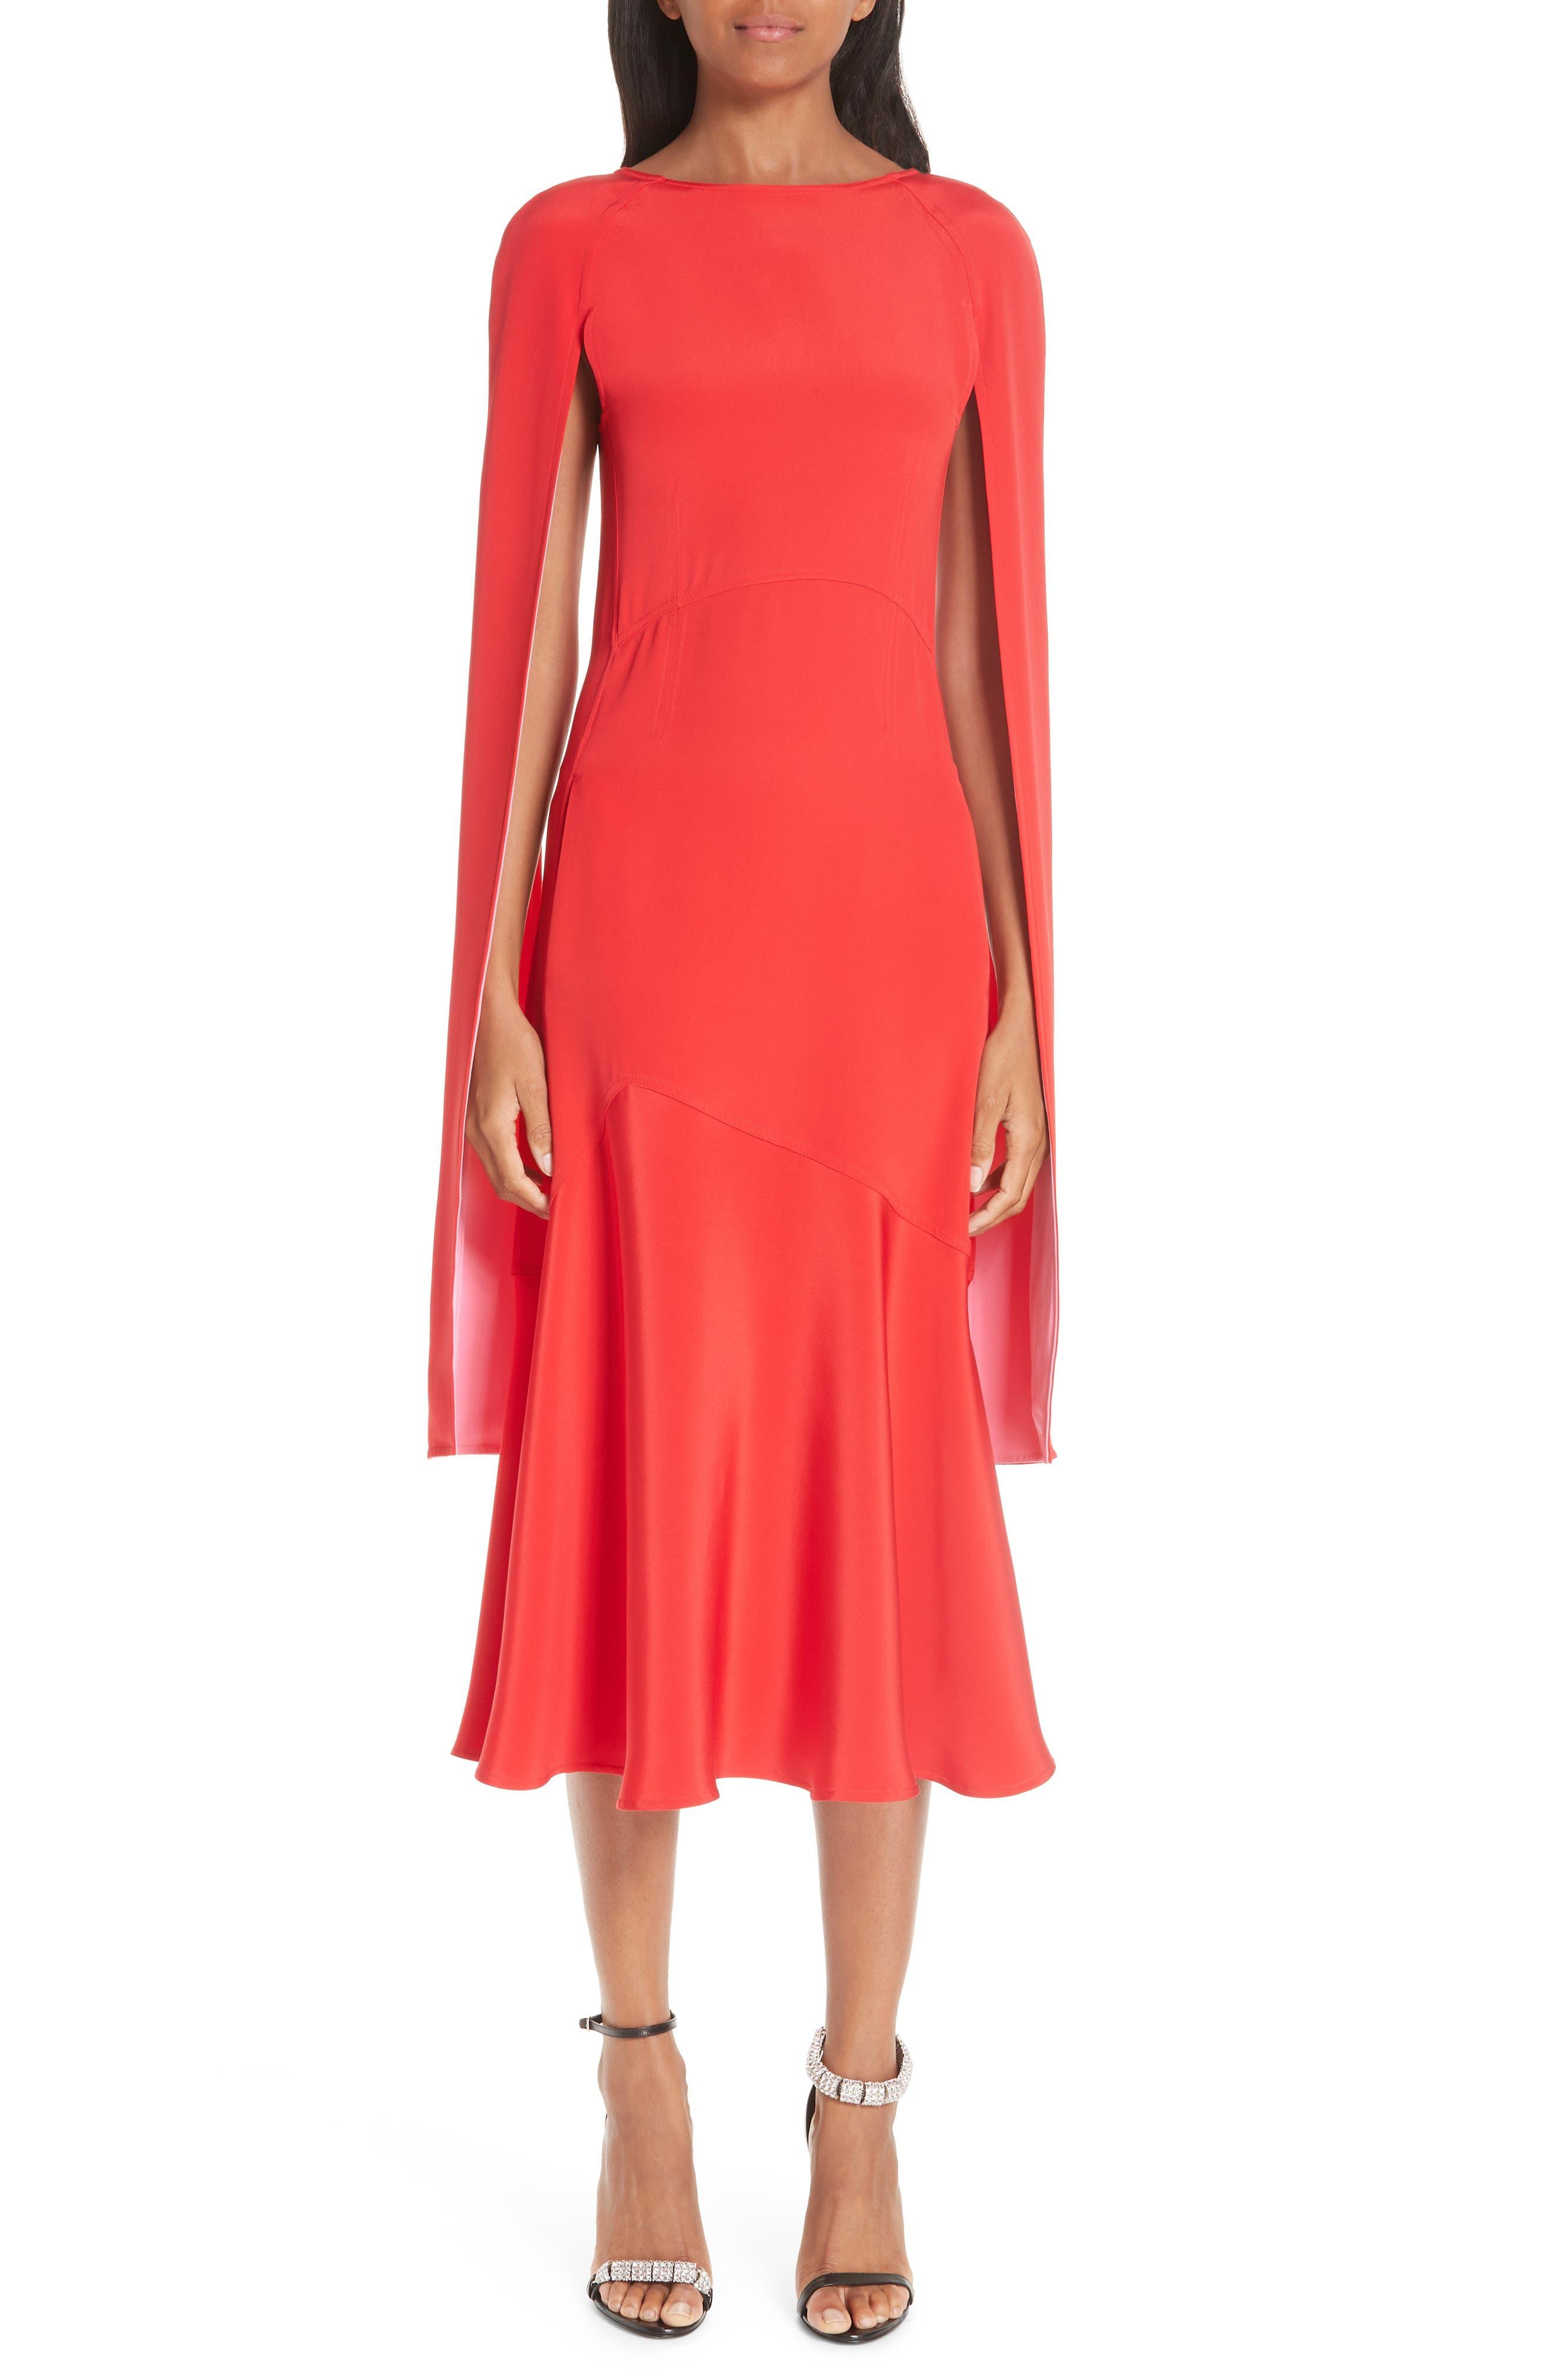 Calvin Klein 205W39Nyc Cape Sleeve Silk Cady Midi Dress, 8 IT - Red